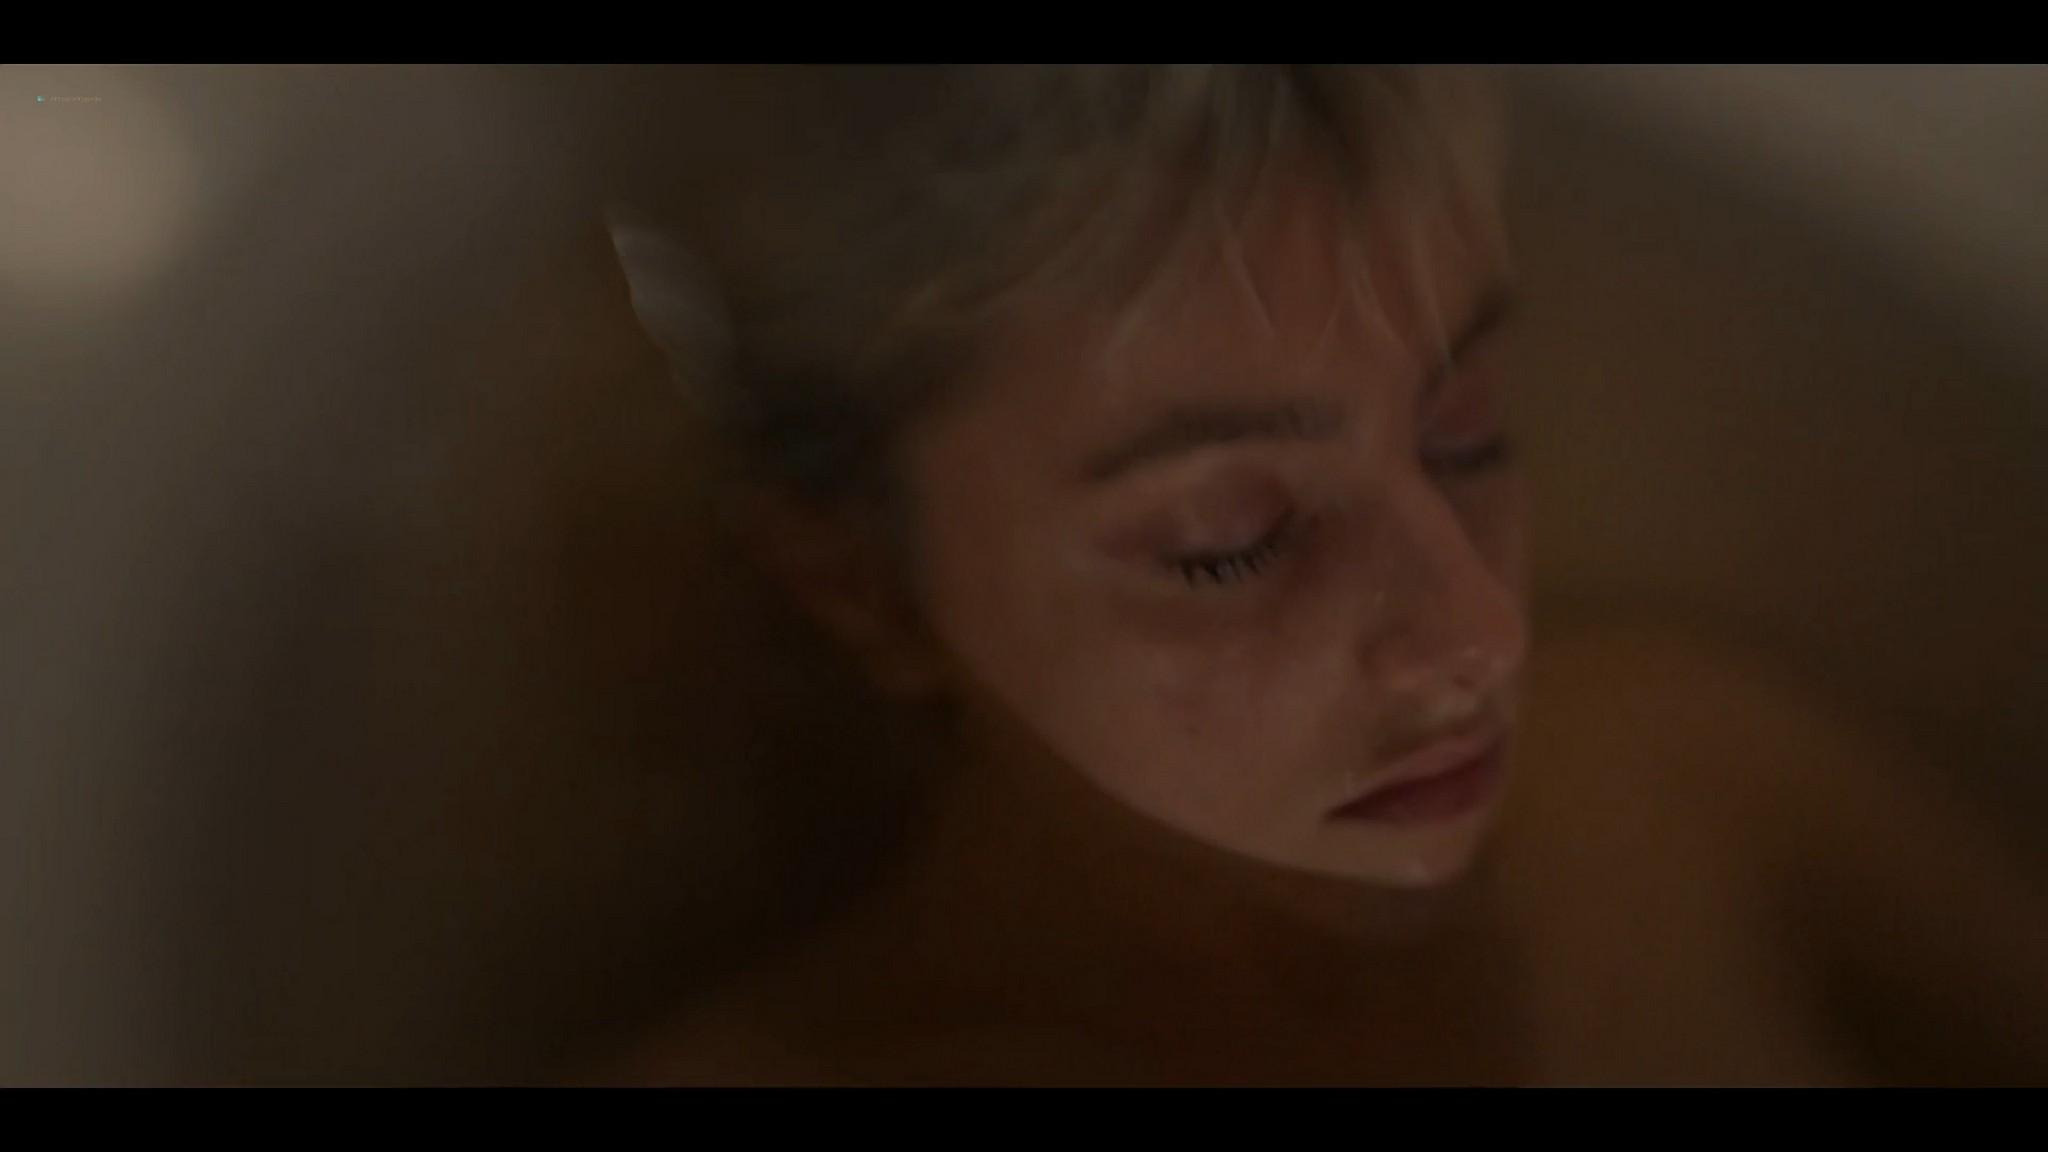 BeBe Bettencourt sexy Sophie Wilde Priscilla Doueihy hot lesbian sex Eden AU 2021 s1e4 8 1080p Web 15